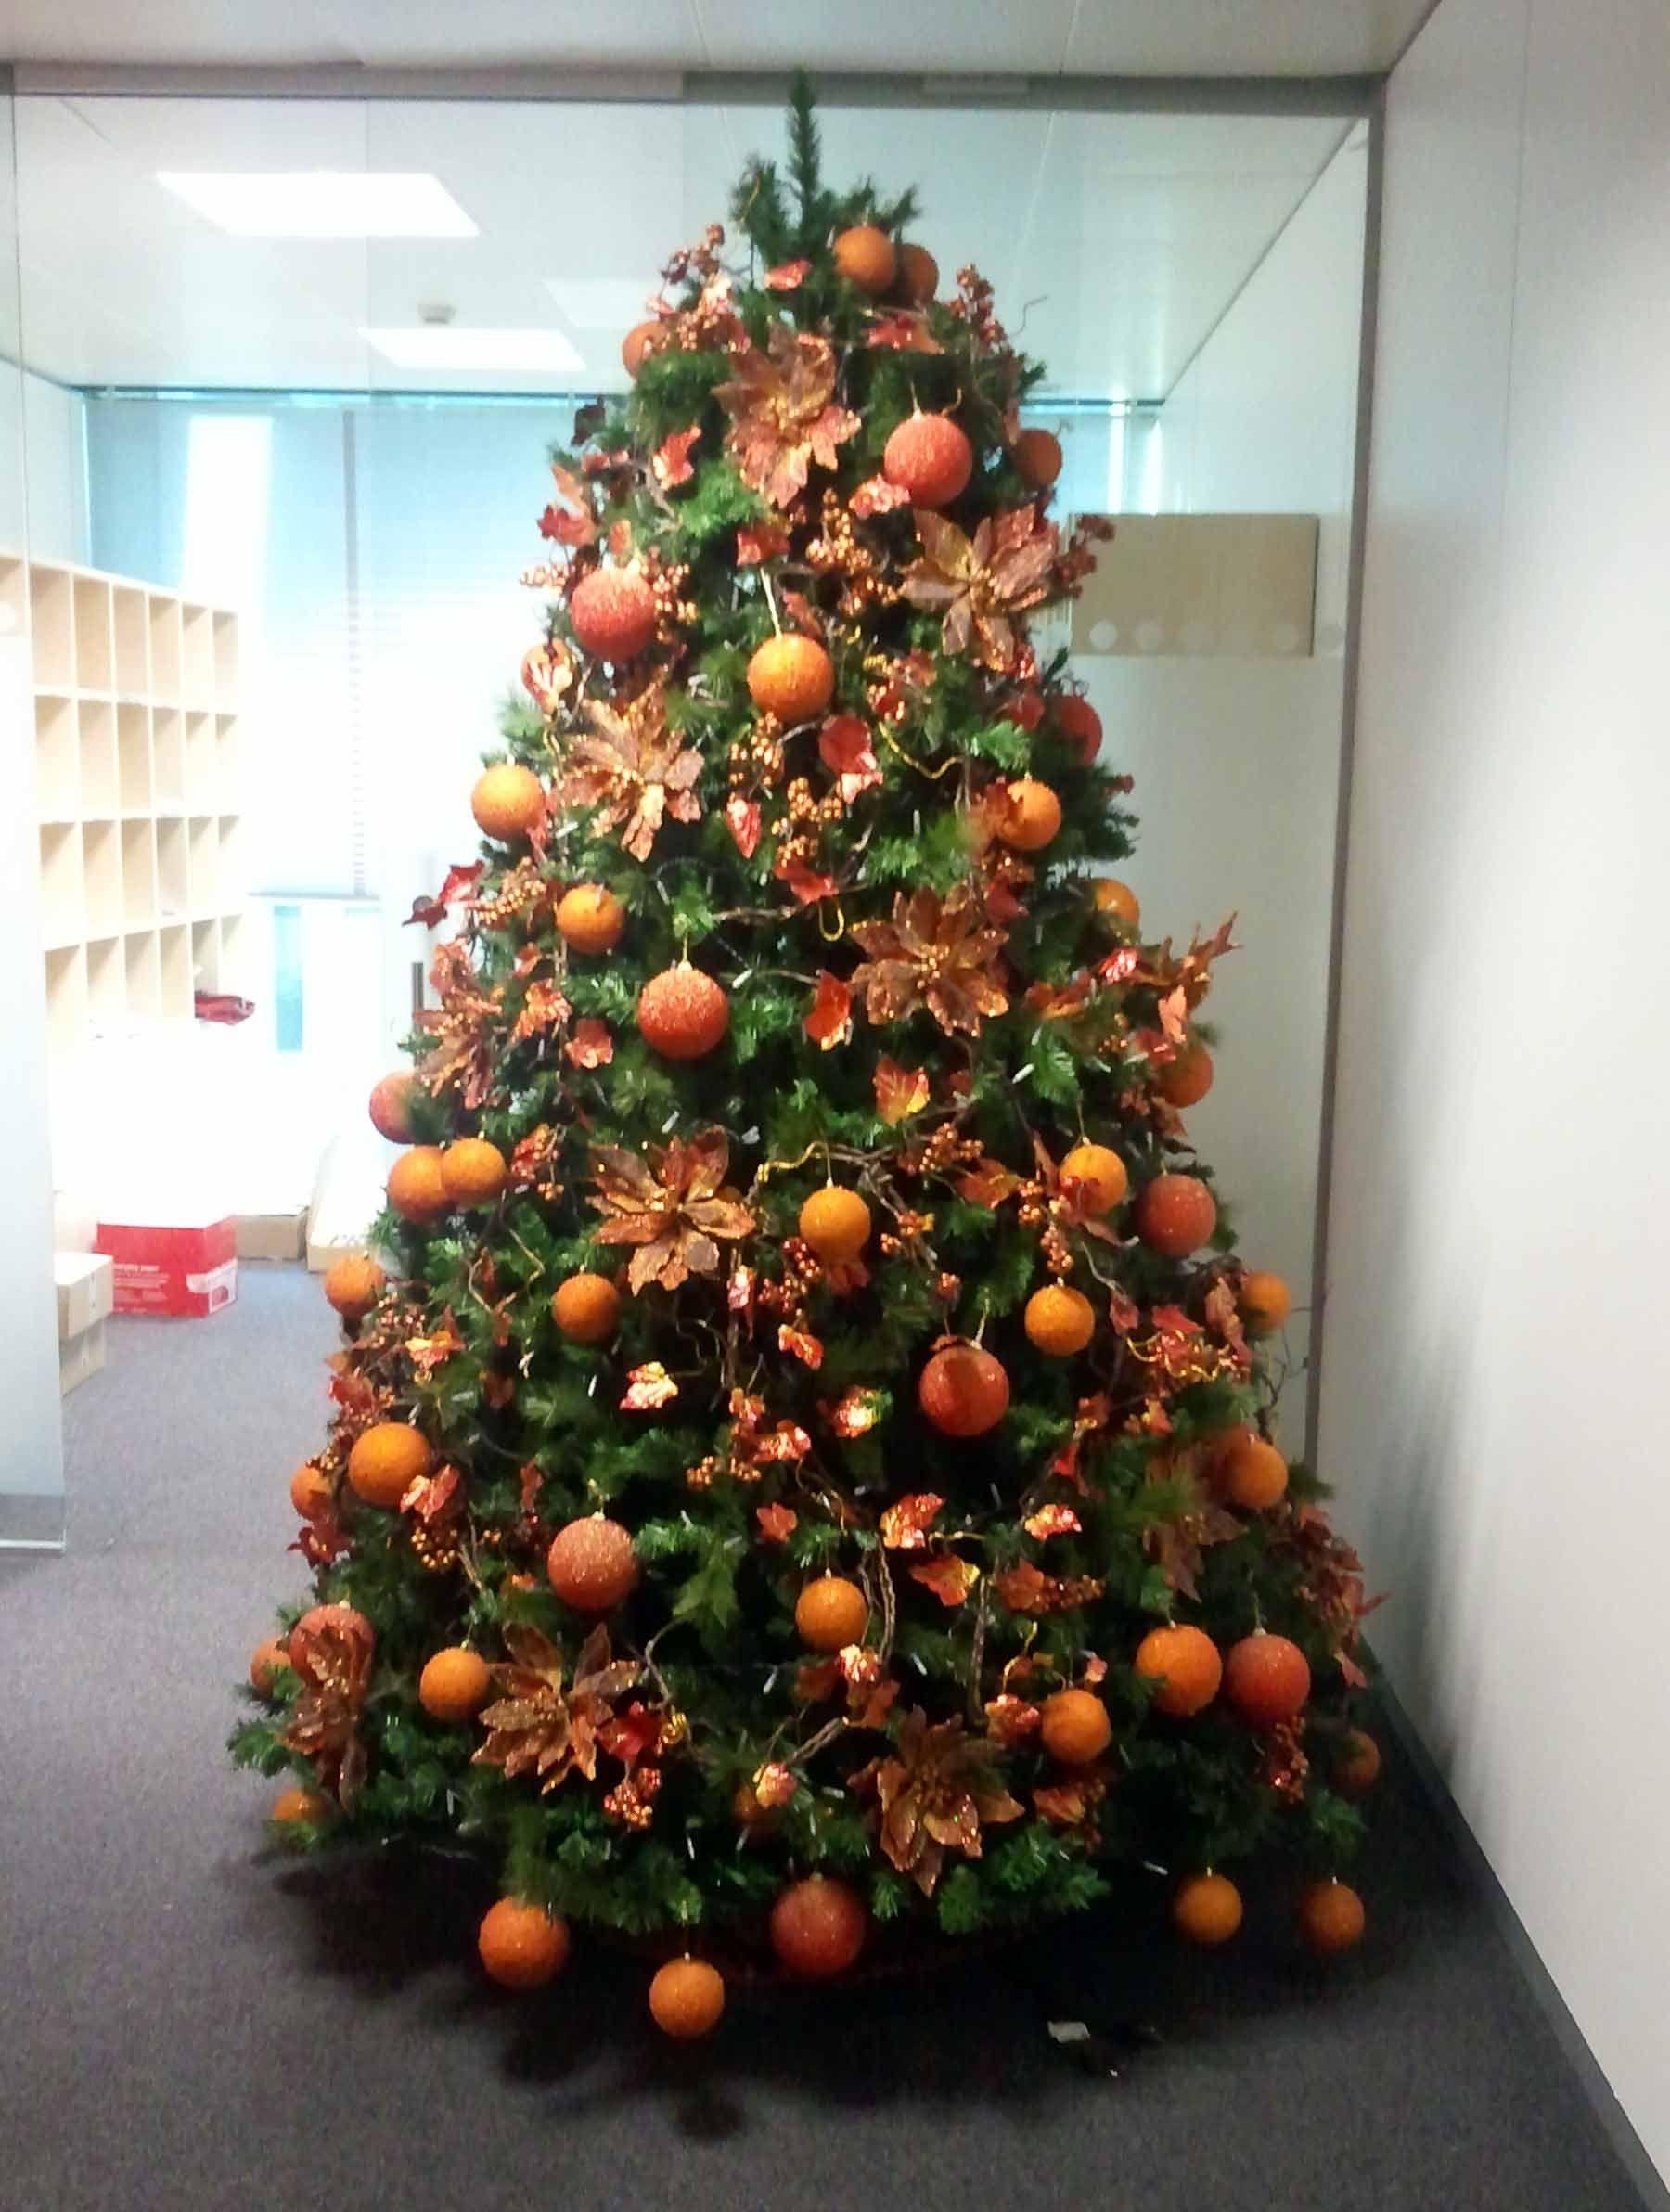 d15f1e50640 arbol decorado en naranja - Google Search Arbol Decorado